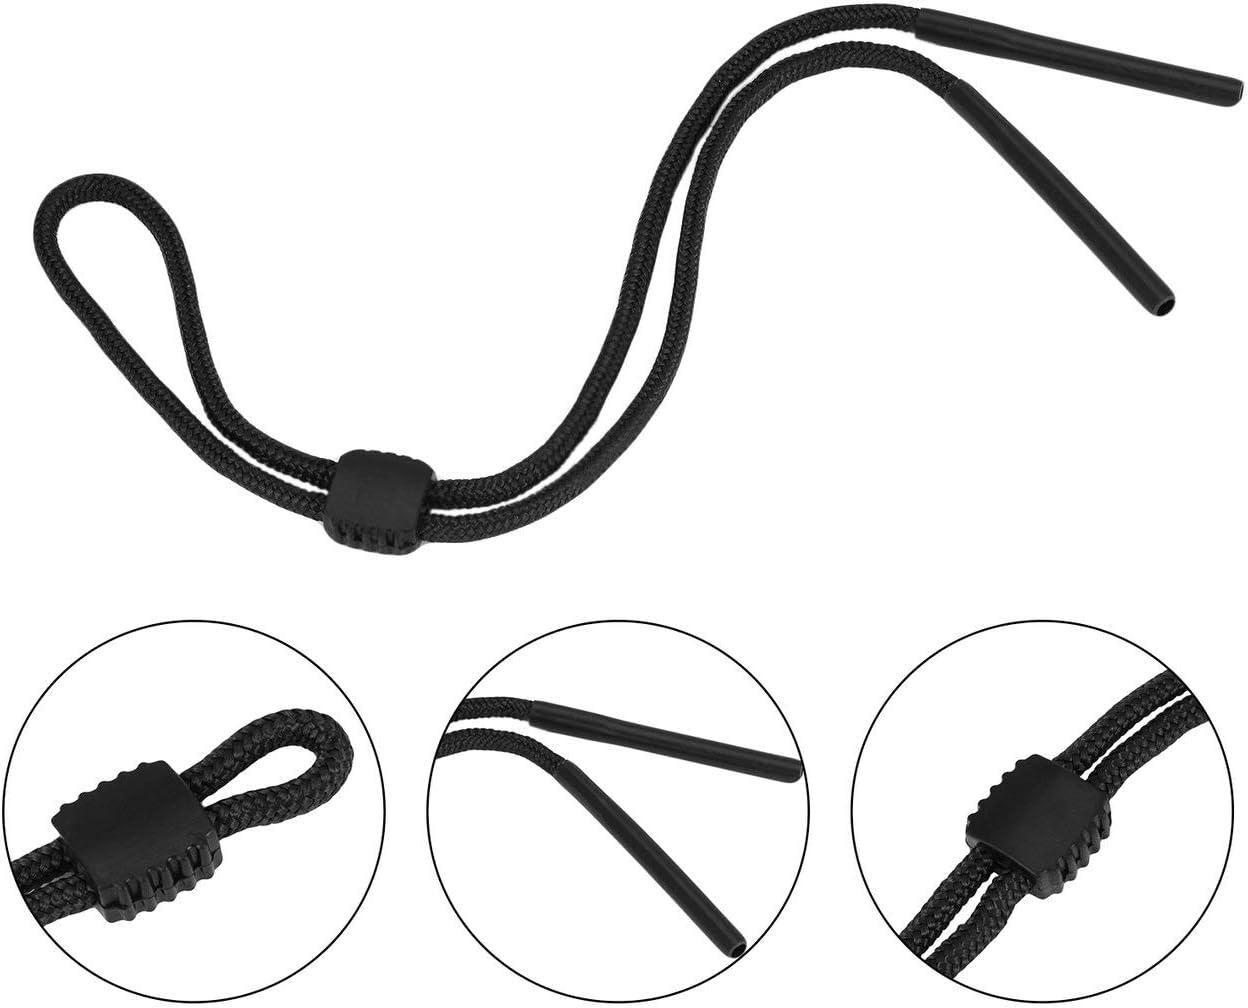 Adjustable Sunglasses Long Lanyards Neck Cord Strap Eyeglasses Glasses String Lanyard Holder Glasses Accessories